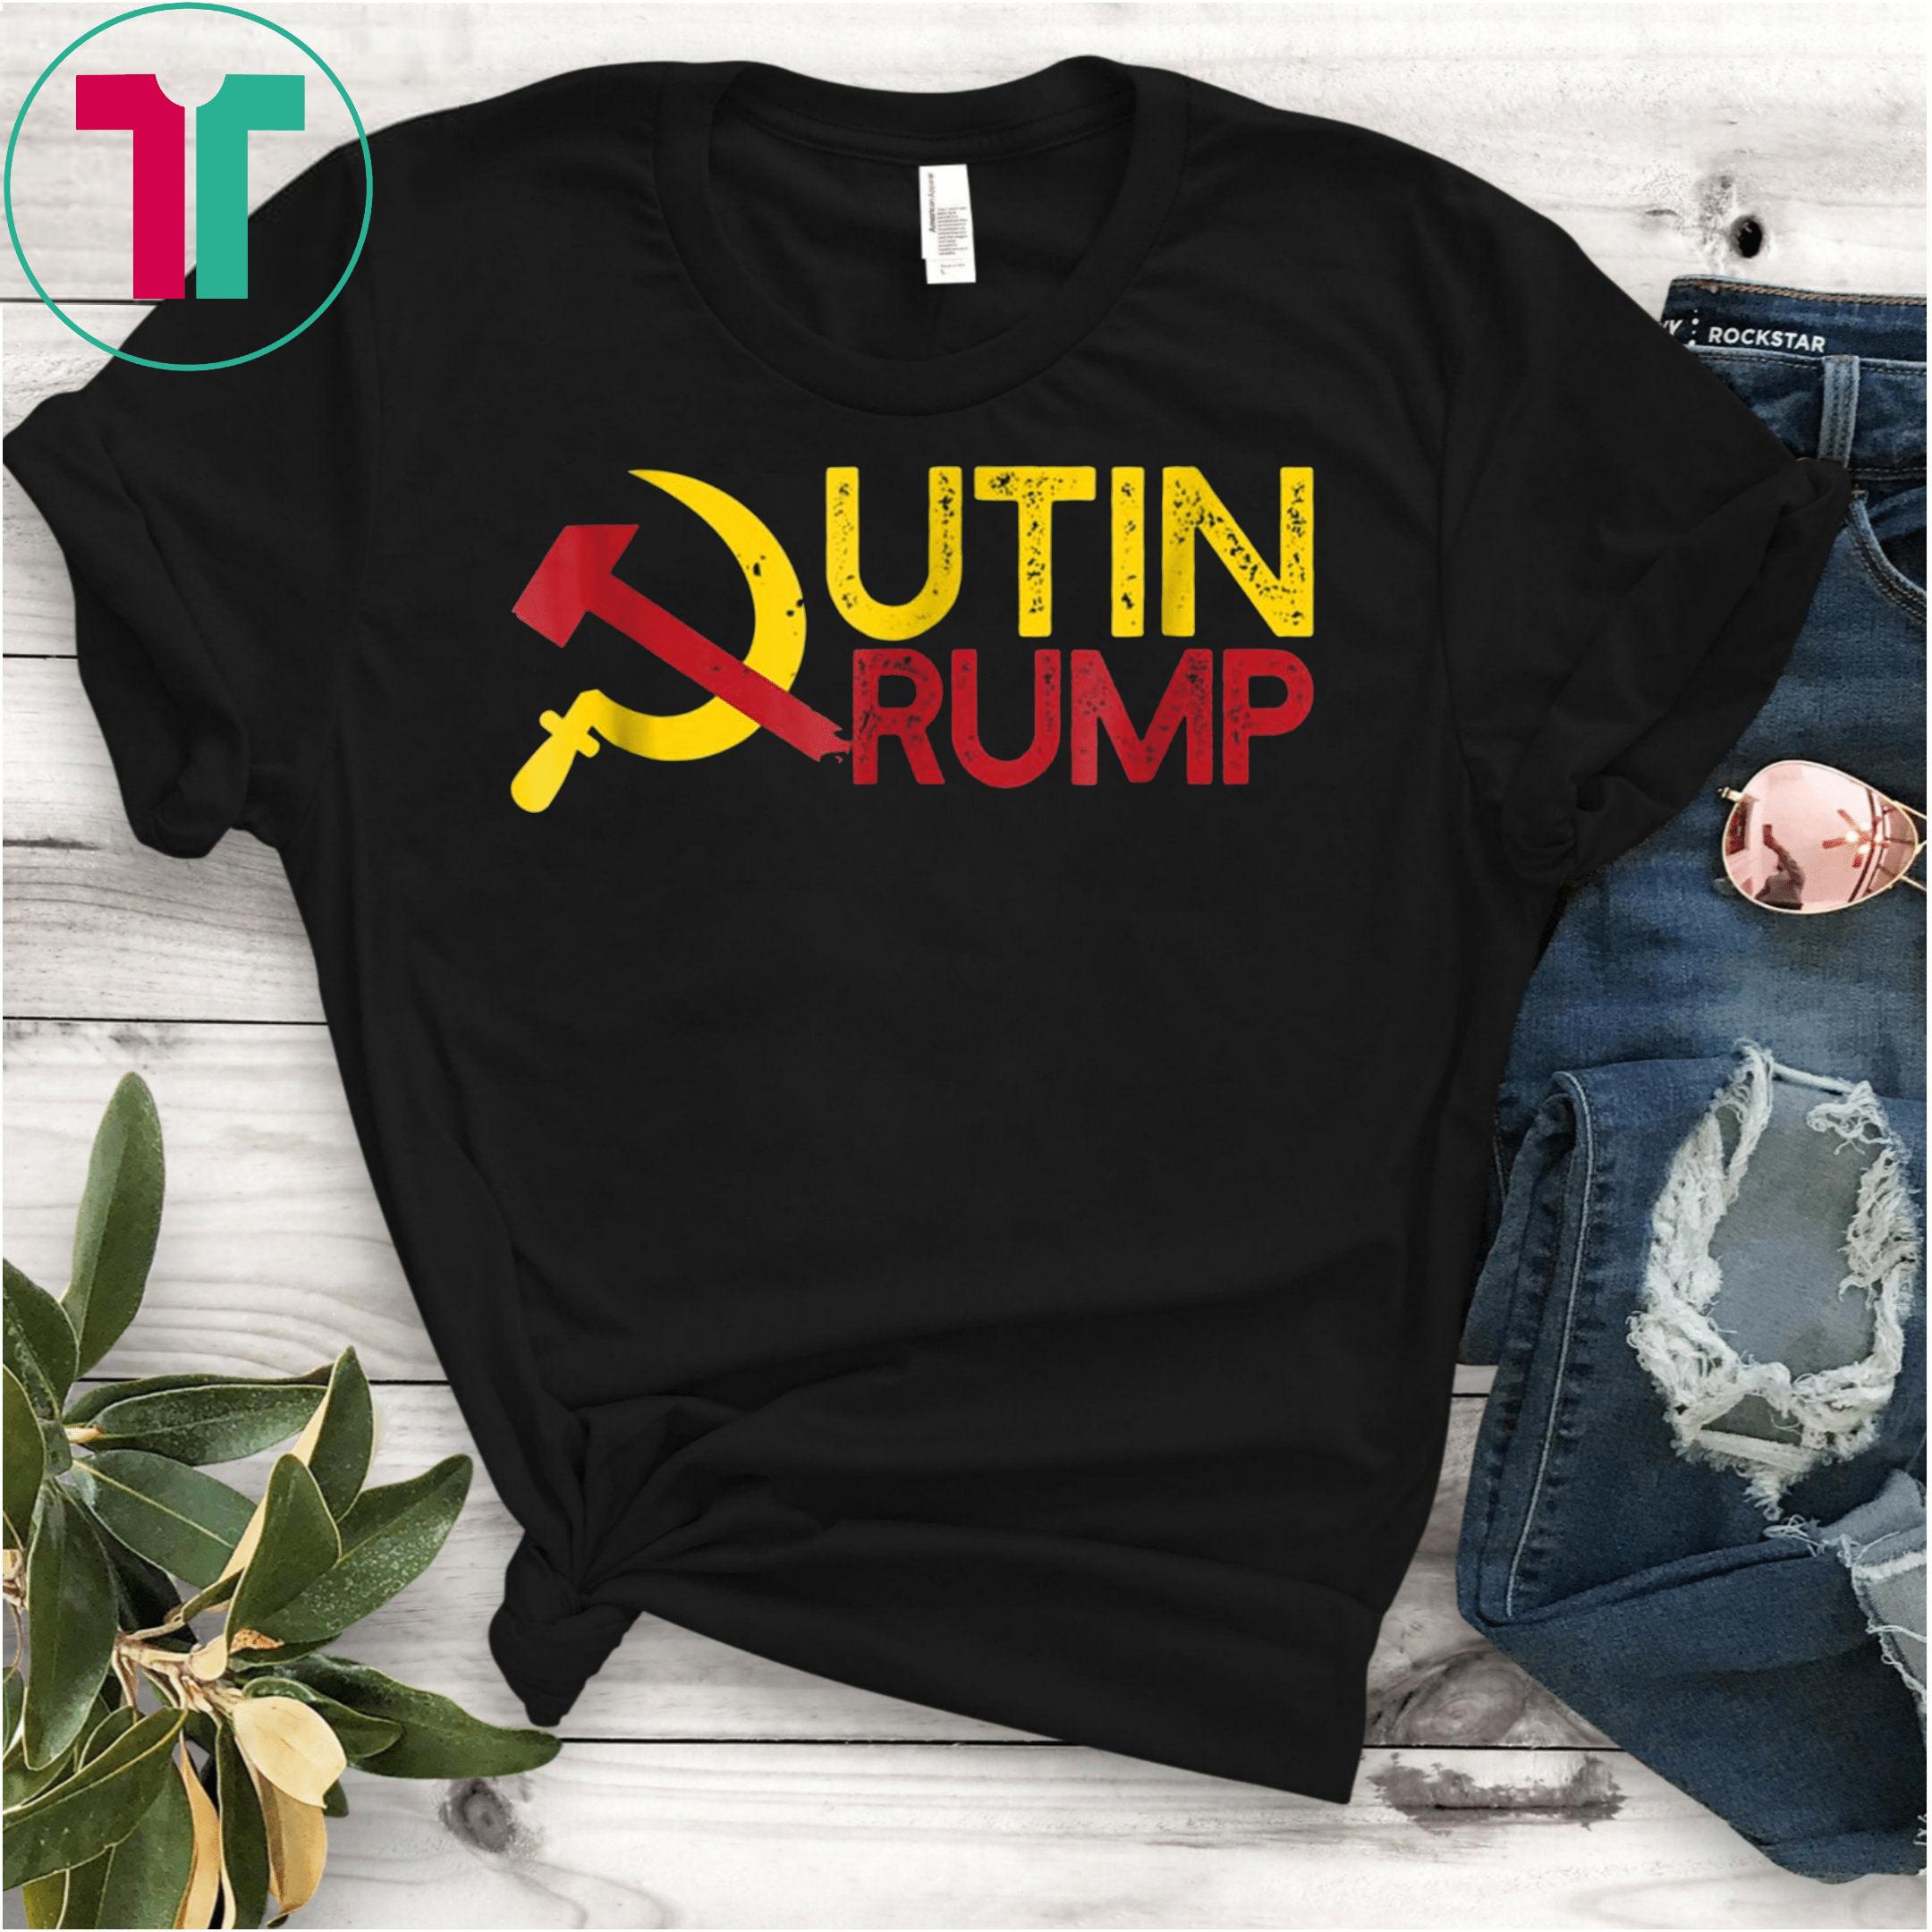 PUTIN TRUMP 2020 Campaign Logo T-Shirt Funny Meme USSR ...